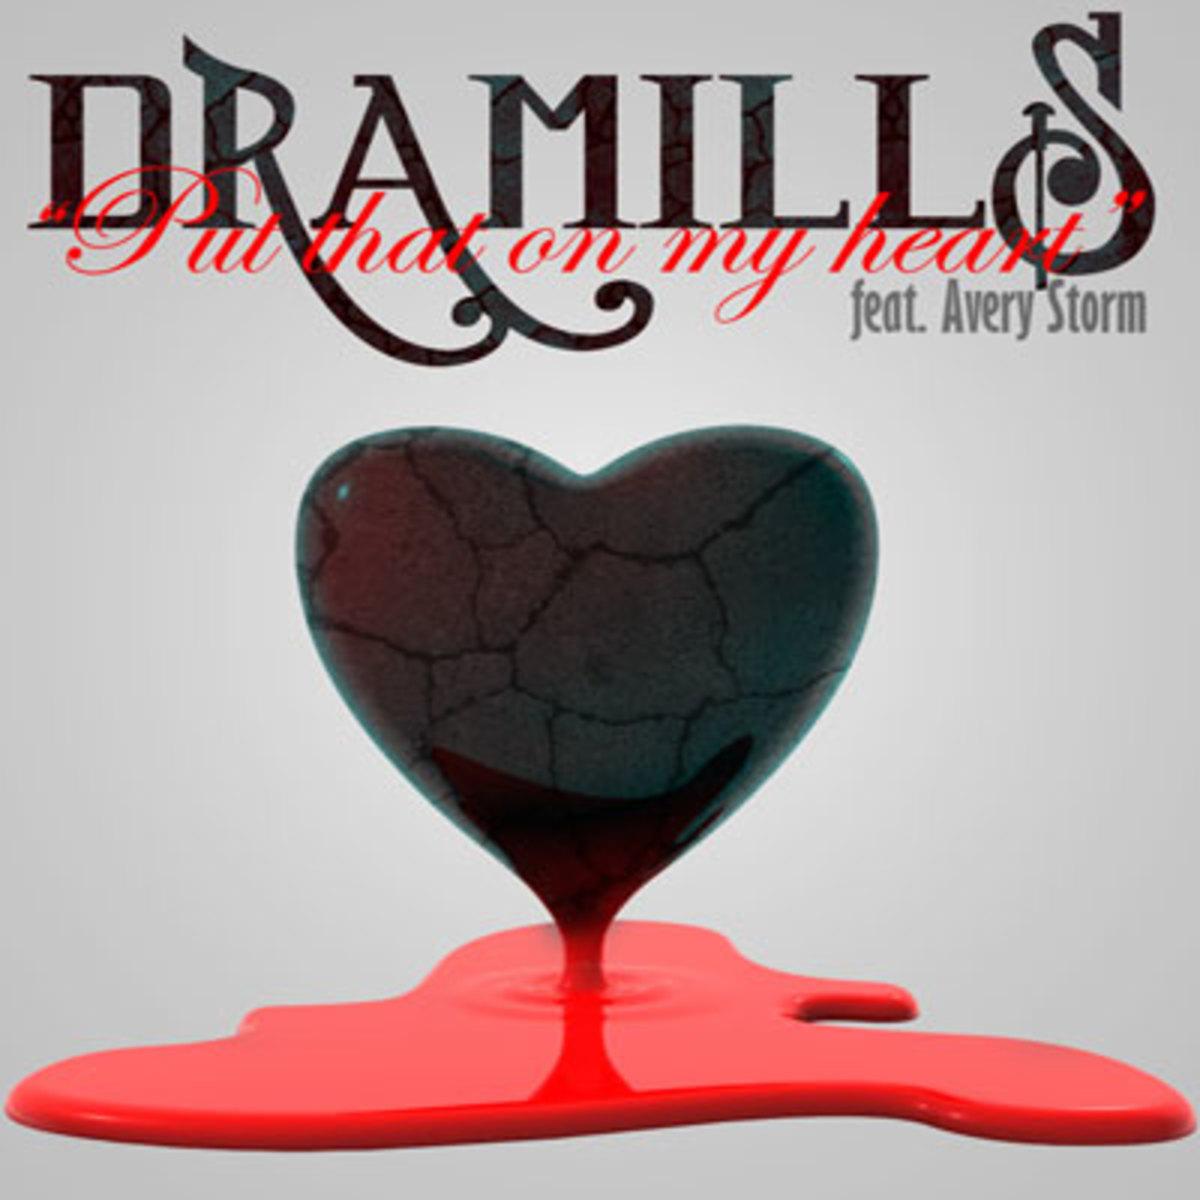 dramills-putthatonmy.jpg